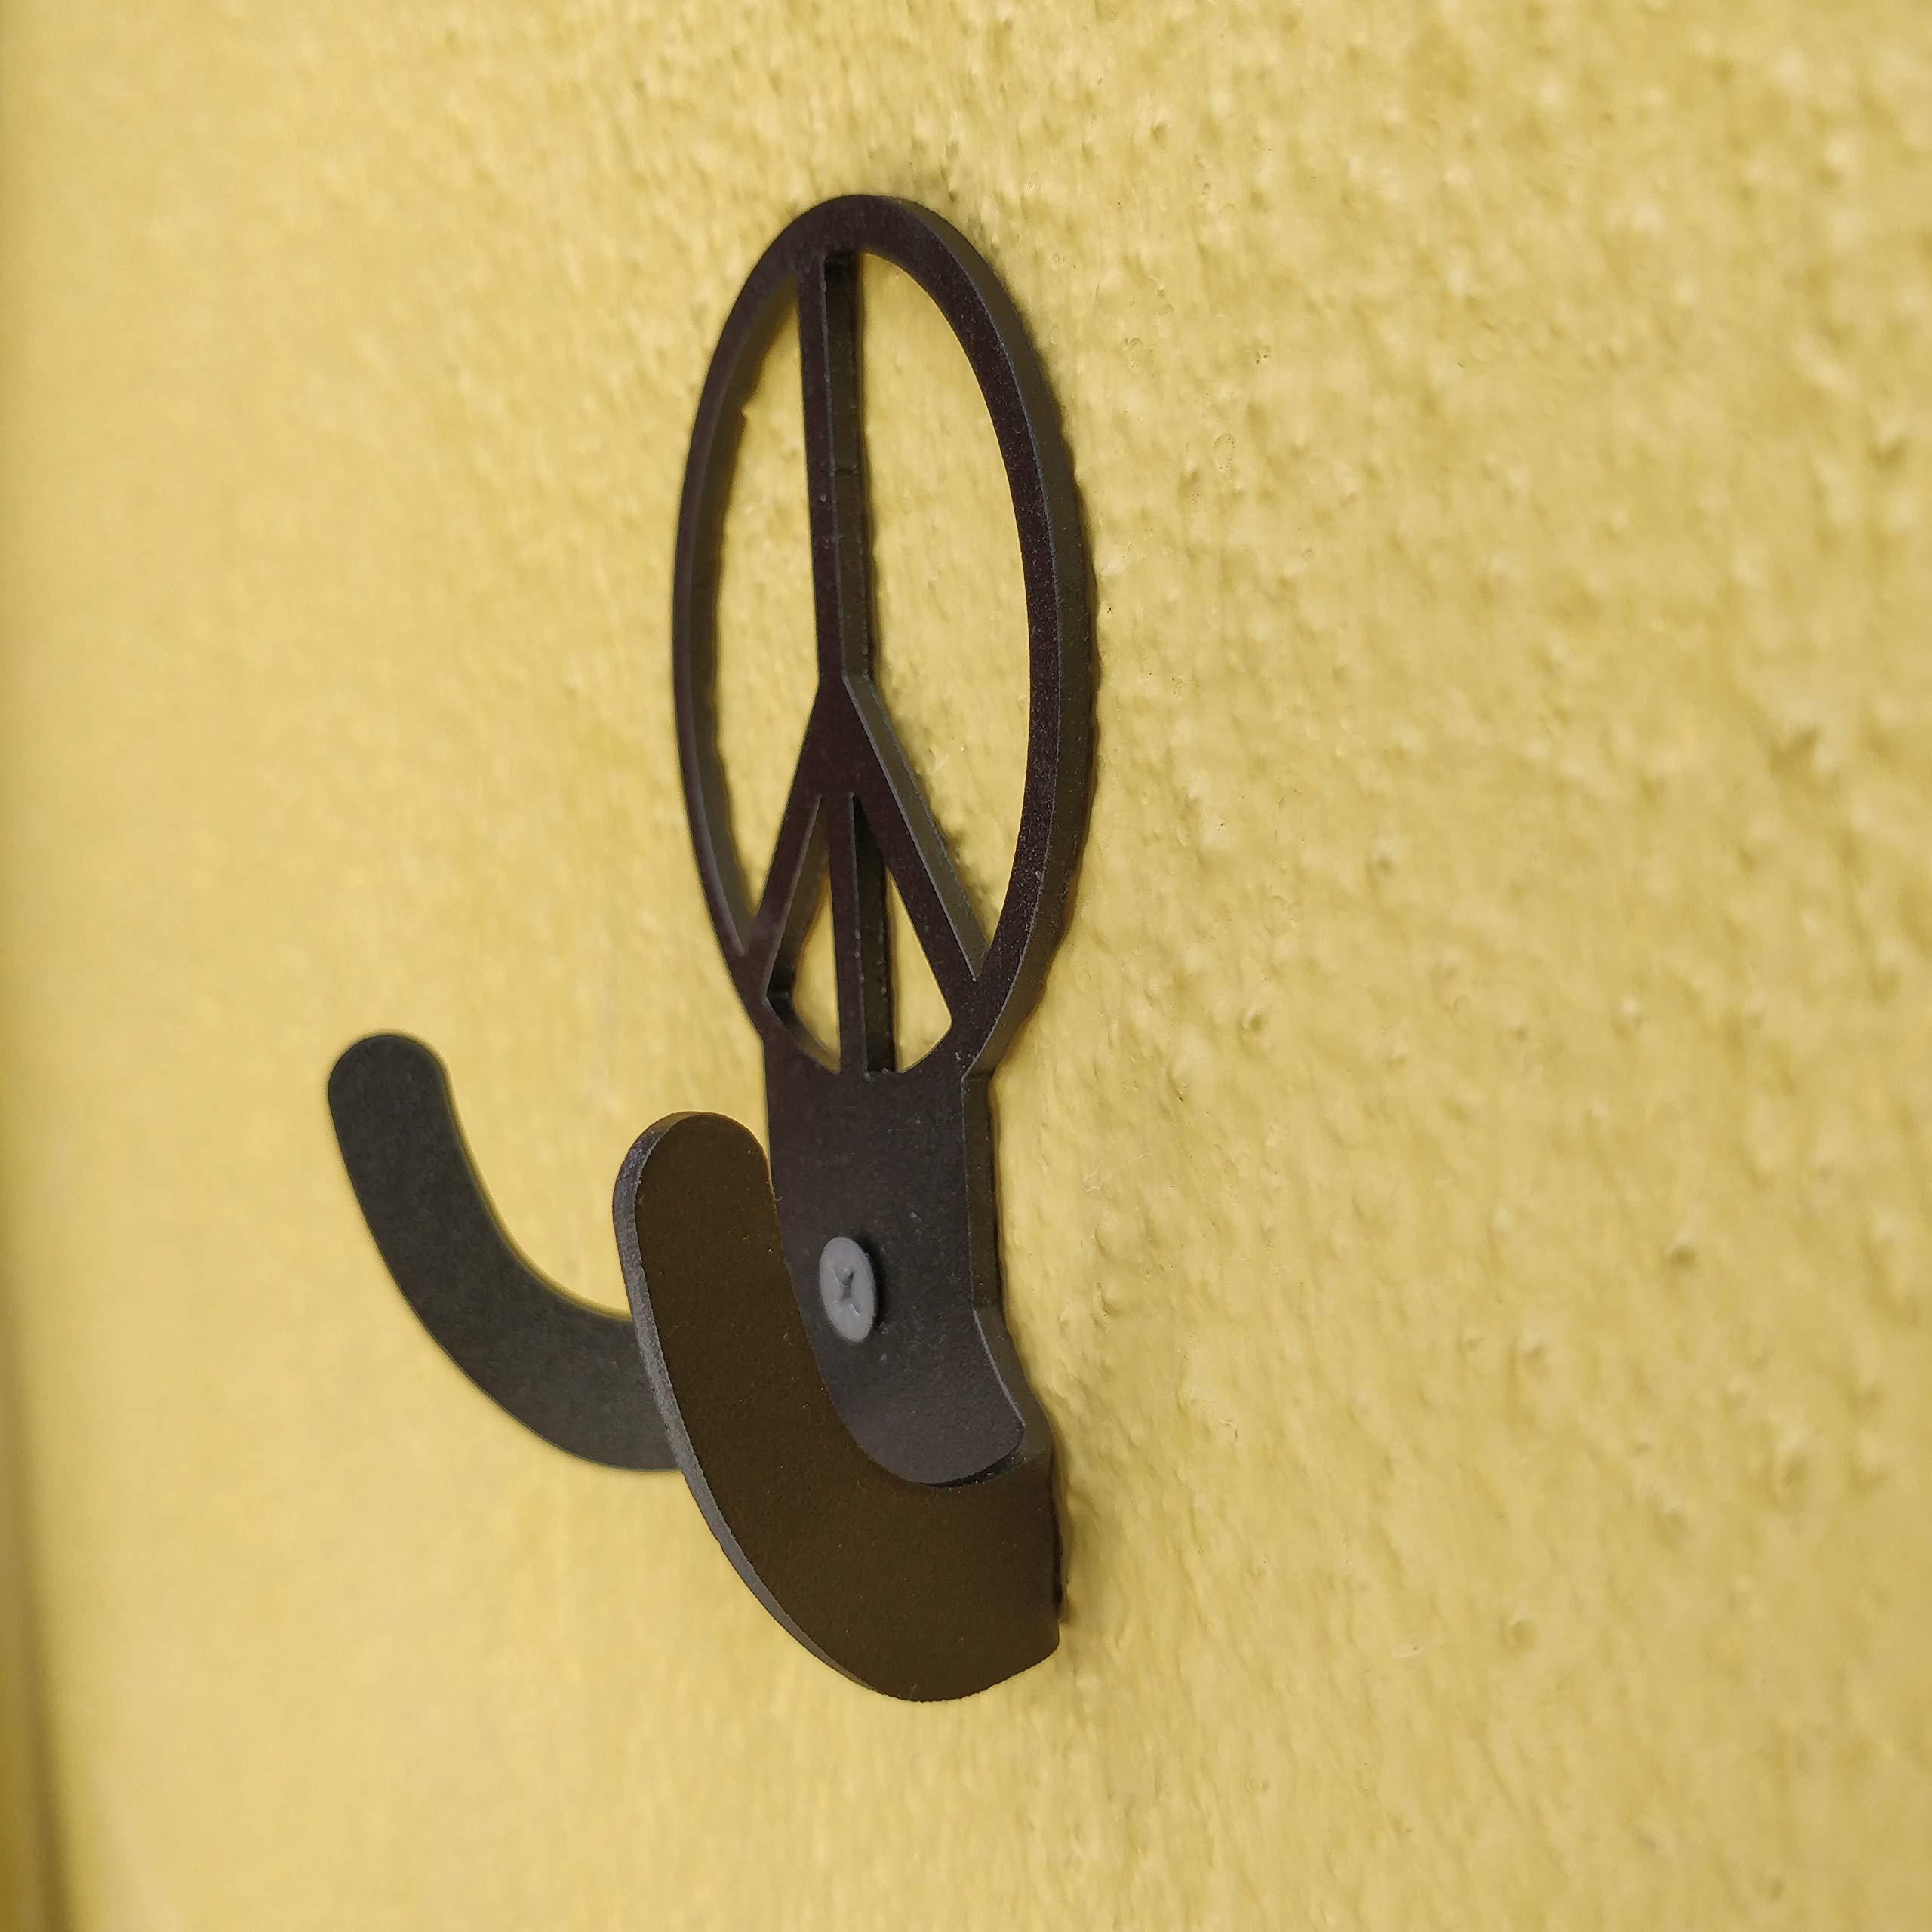 HeavenlyKraft Peacelogo Steel Wall Hook Dual Holder for Living Room Coat Hat Robe Hanger Bathroom Towel Kitchen Strong Heavy Duty Garage Storage Organizer Utensil Hook Single, 4 X 3.14 X 1.4 Inch by HeavenlyKraft (Image #3)